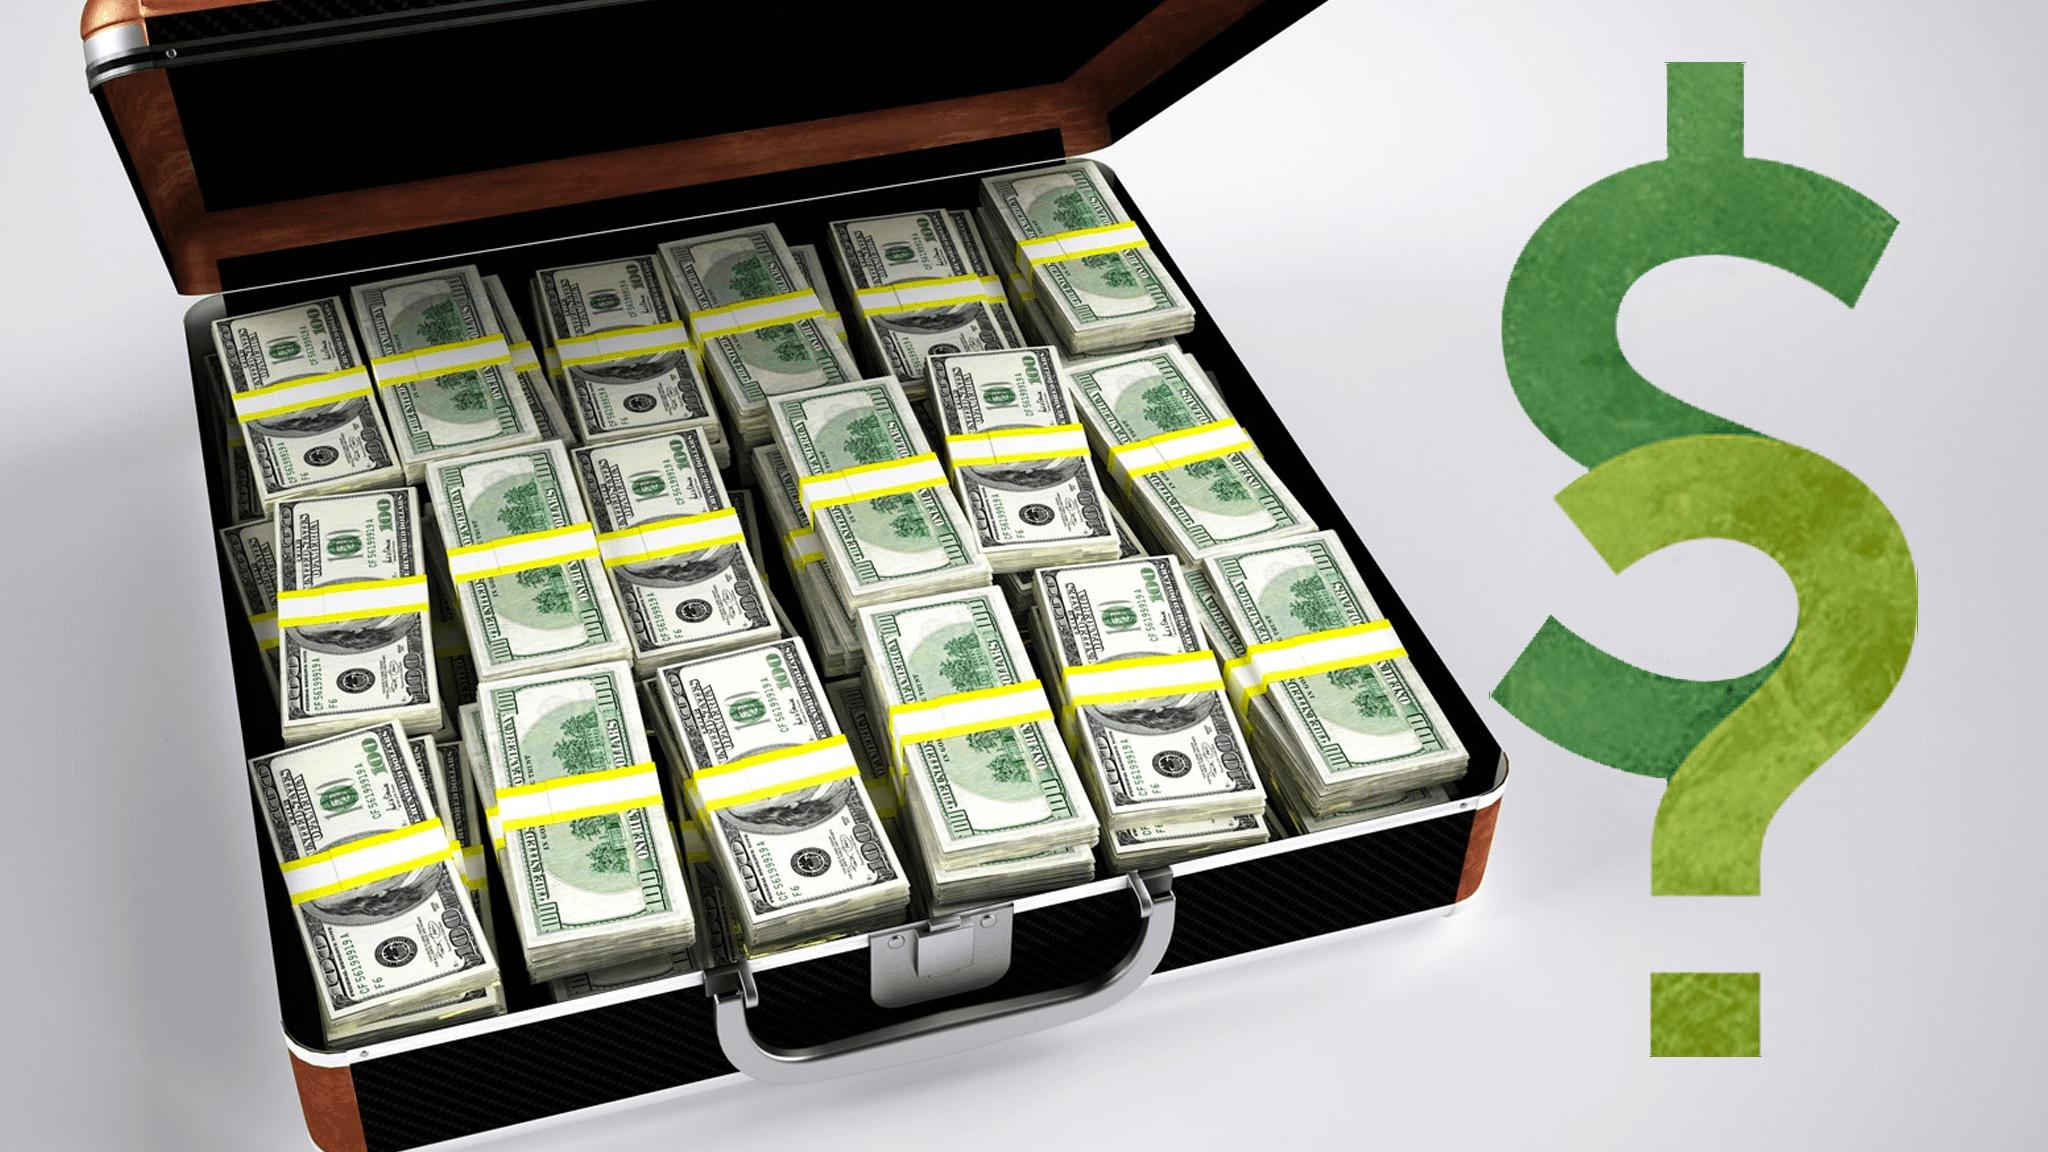 Making money as a web designer